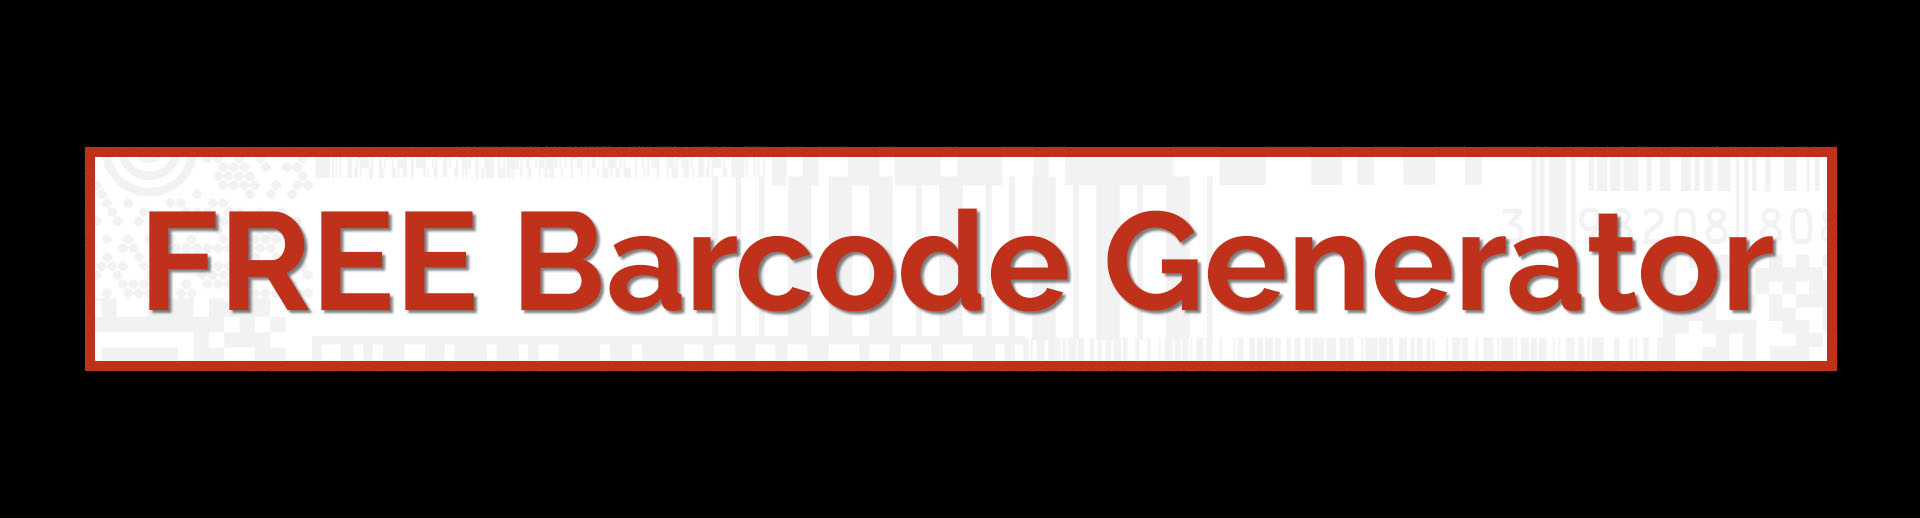 Free-Barcode-Generator-2_20170815155737_0 (1)